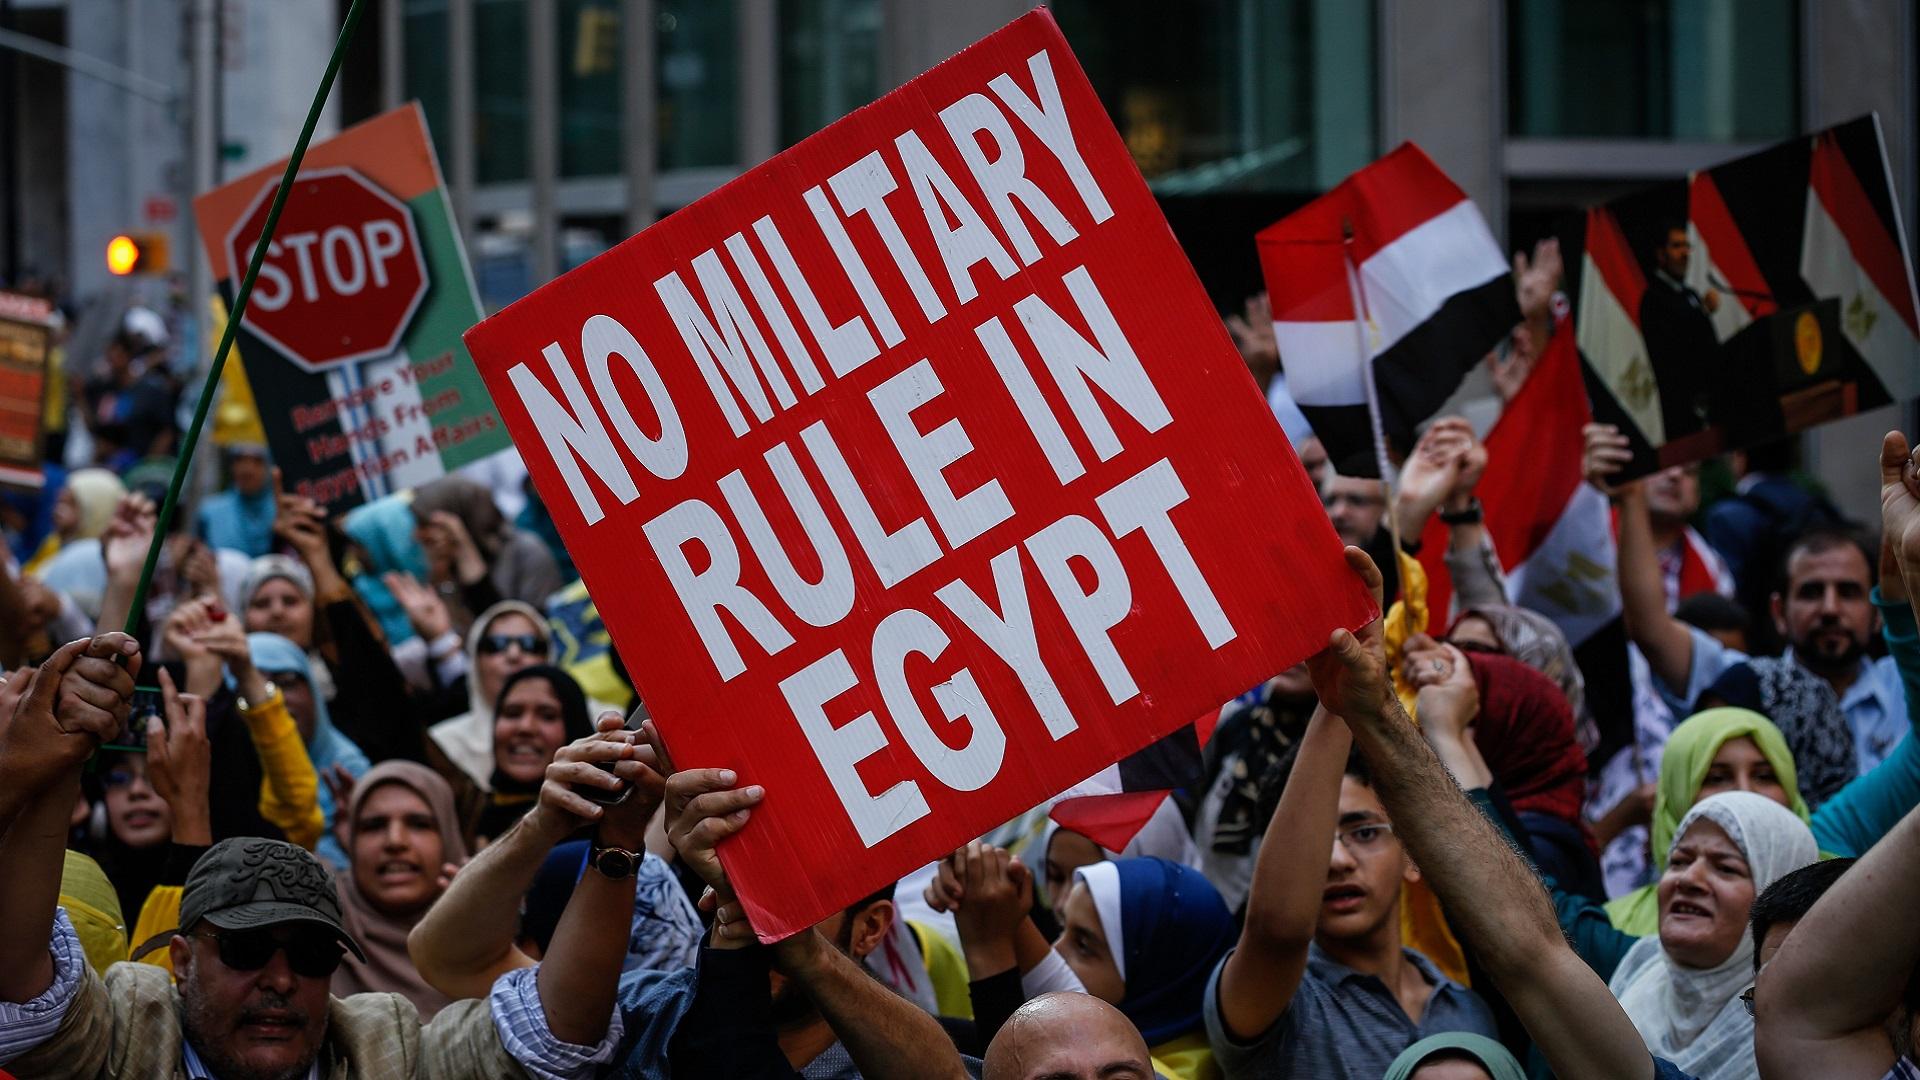 Morsi supporters rally in New York to mark Rabaa and Nahda massacres